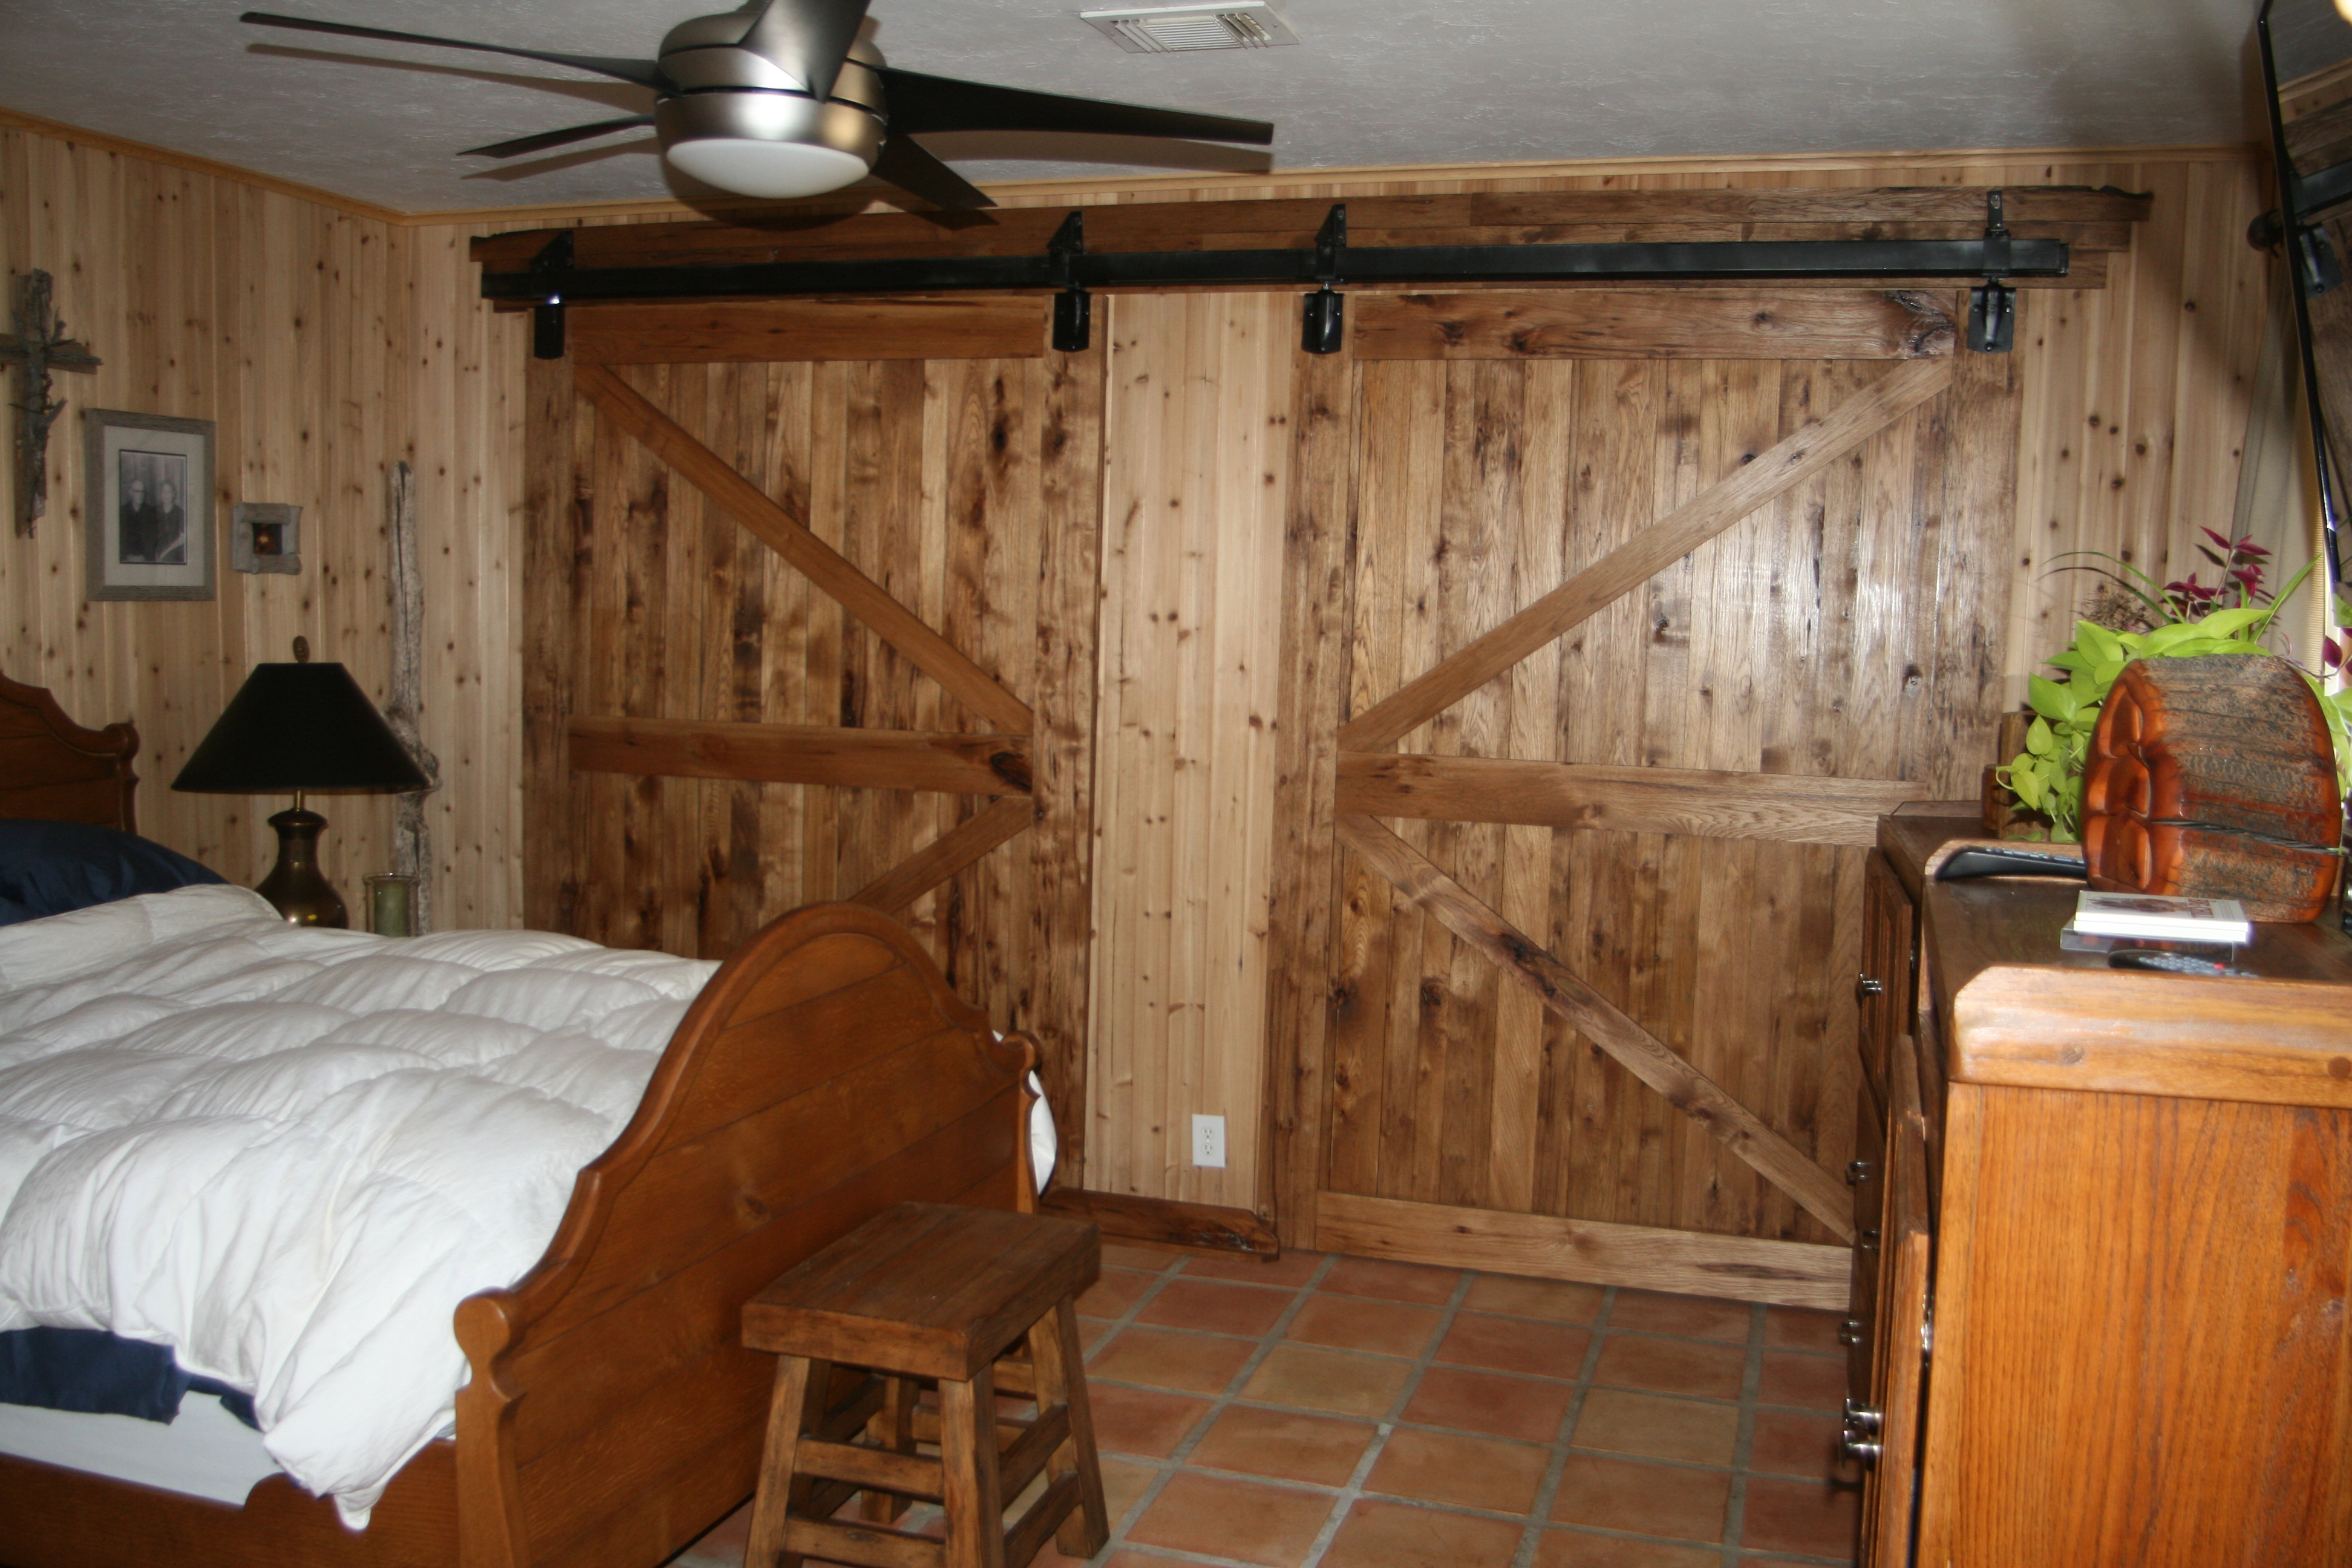 Lindy Williams Interiors Laundry Room Sliding Barn Door Style Barn Style  Bedroom Ideas Decoration Natural.